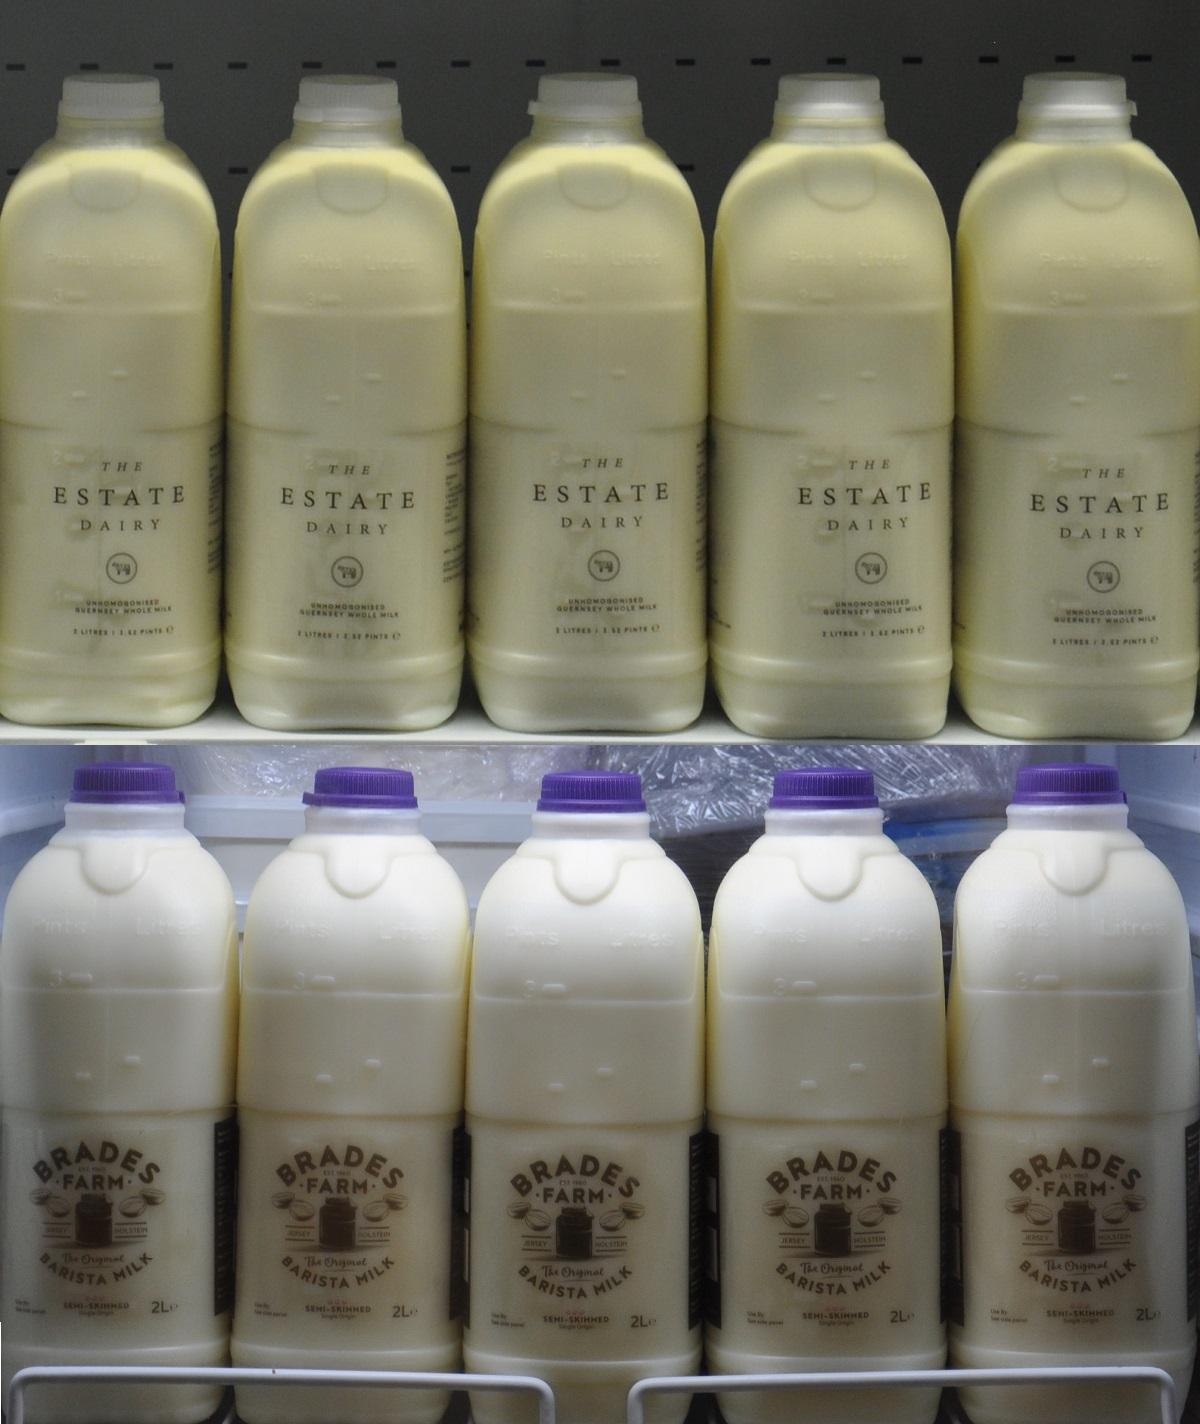 It's milk all round at the London Coffee Festival in 2017. Top row, The Estate Dairy. Bottom row, Allan Reeder Ltd's Brades Farm barista milk.